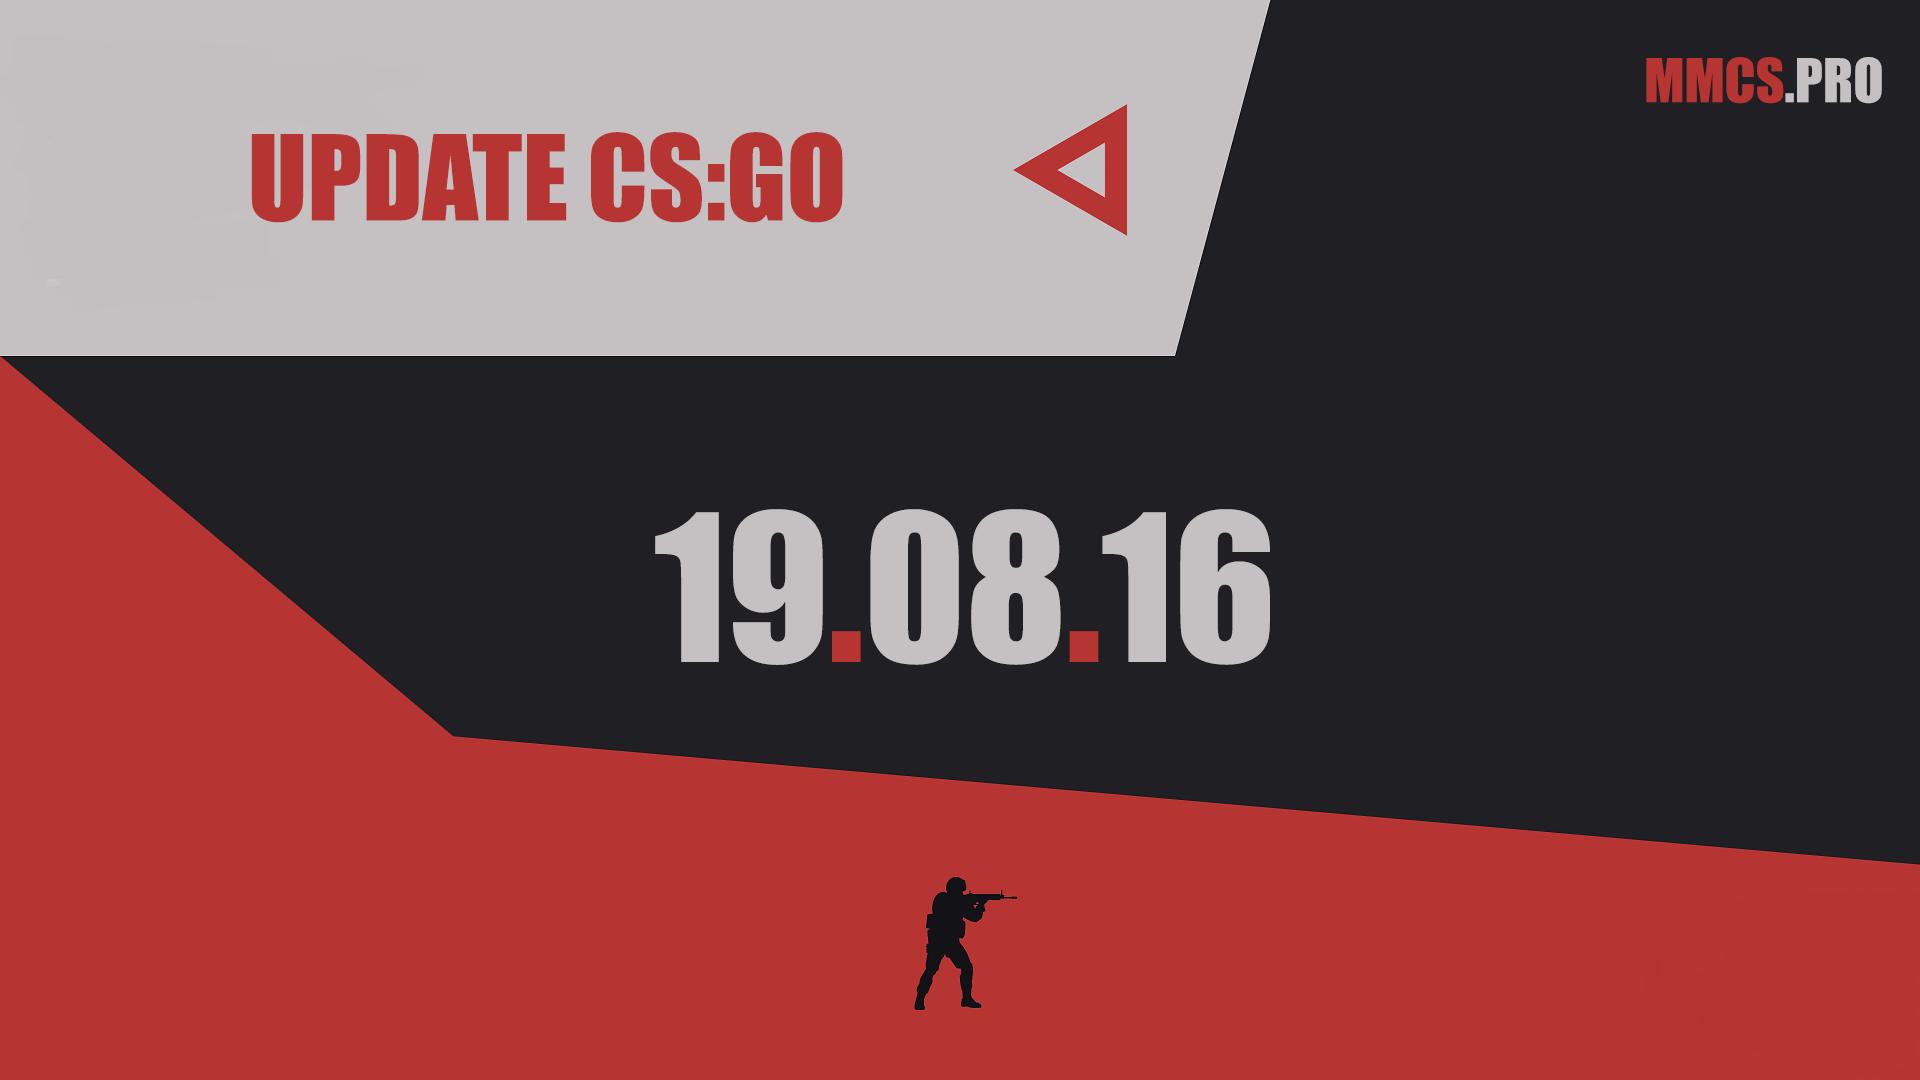 https://mmcs.pro/update-csgo-19-08-2016-valve/